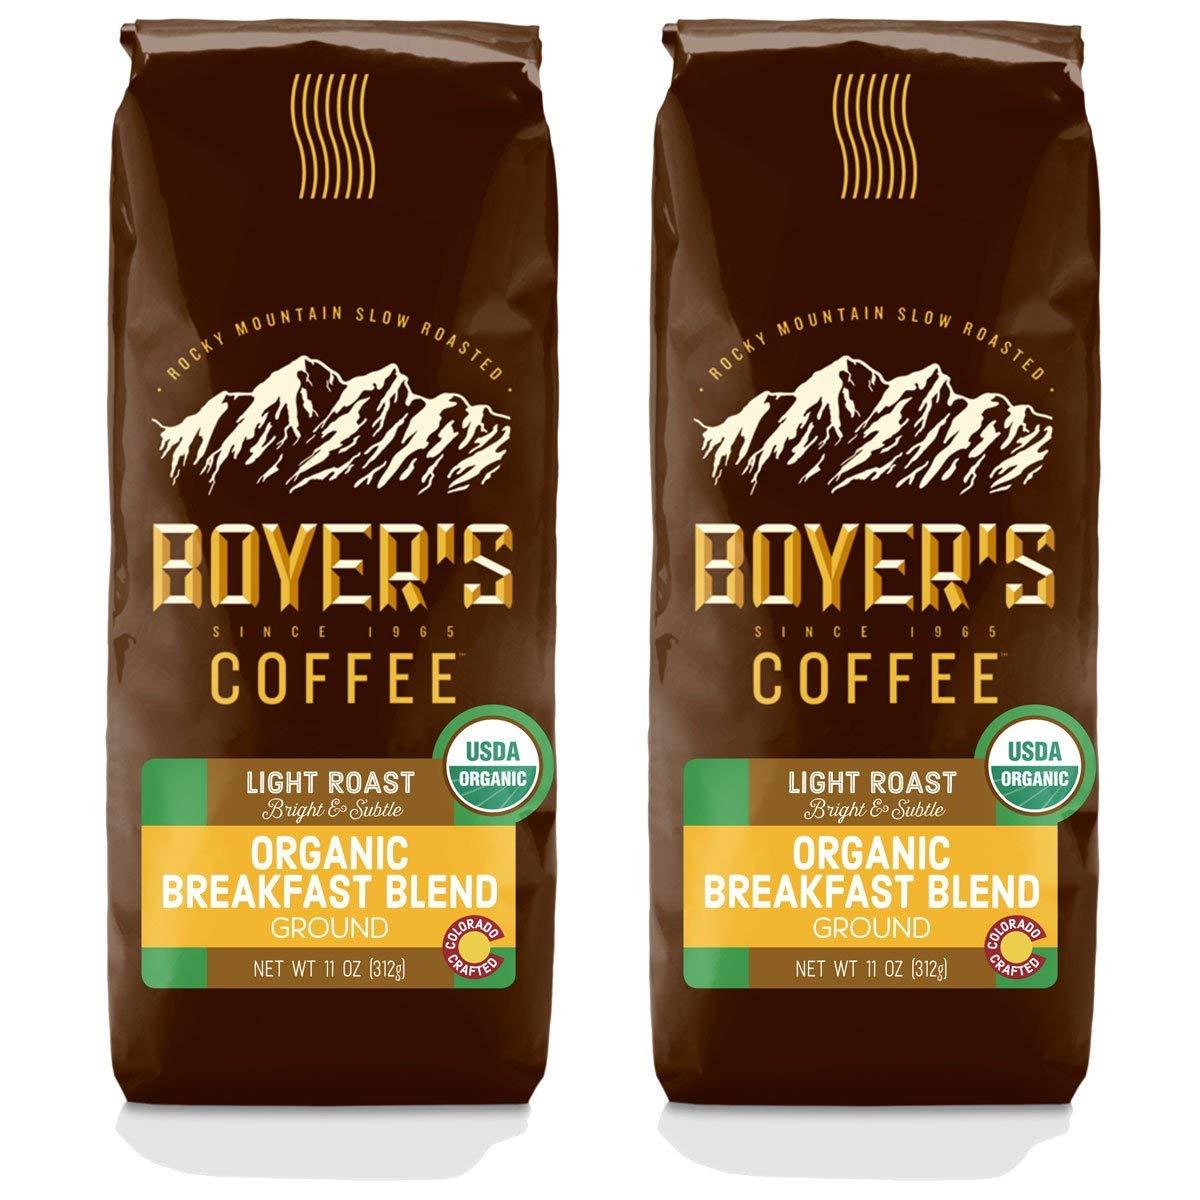 Organic Breakfast Blend, Light Roast, Ground Coffee, 2-Pack (22oz)